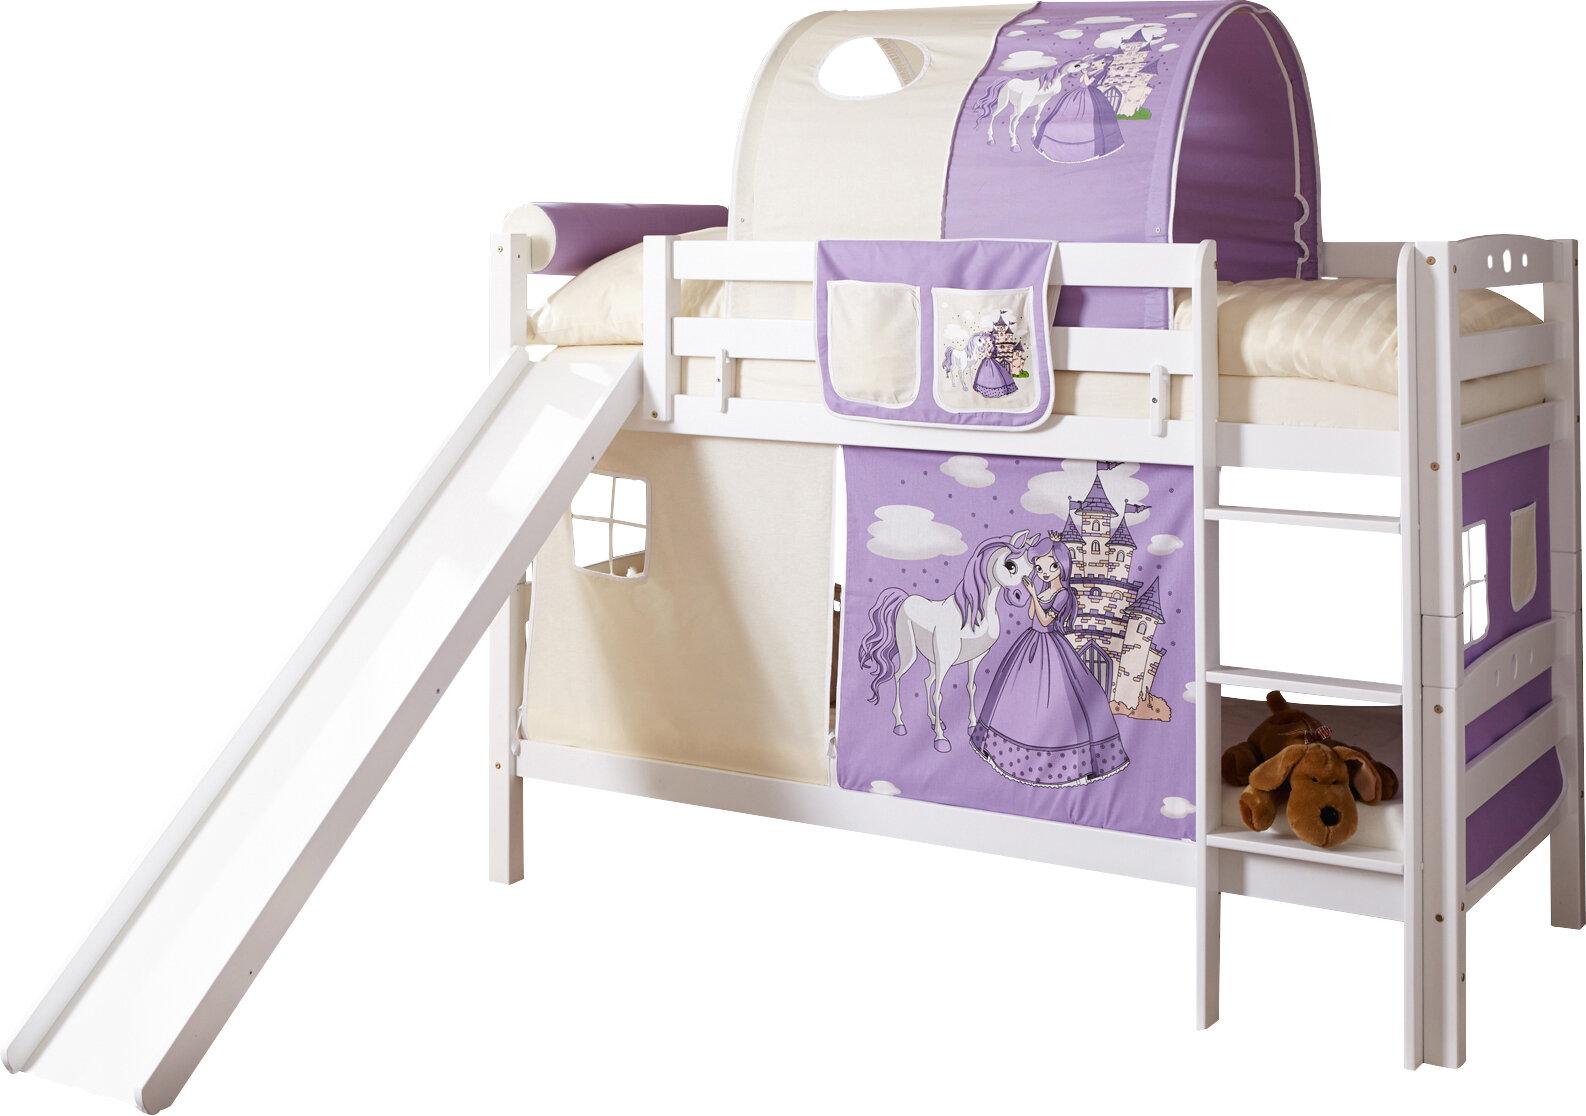 Etagenbett Umbaubar In 2 Einzelbetten : Kinderhochbett kinderhochbetten günstig kaufen betten